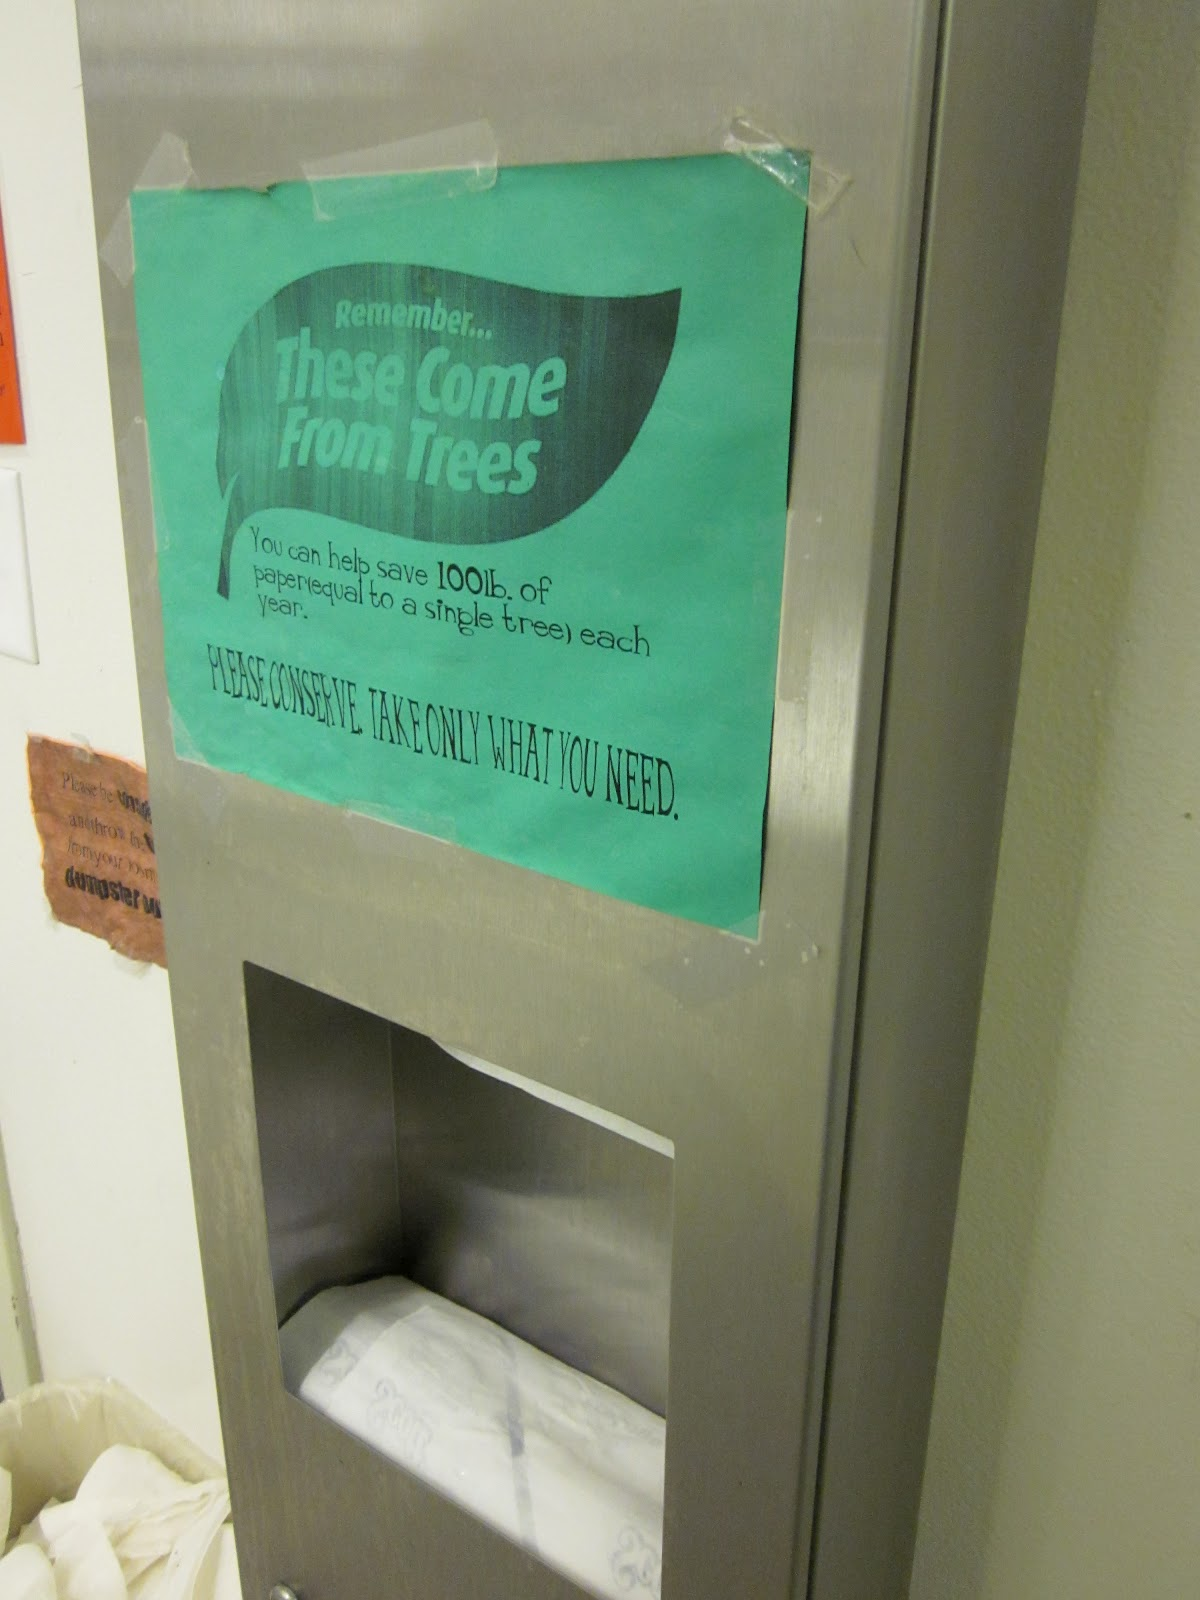 UC Santa Cruz Sustainability fice May 2012 Sustainability